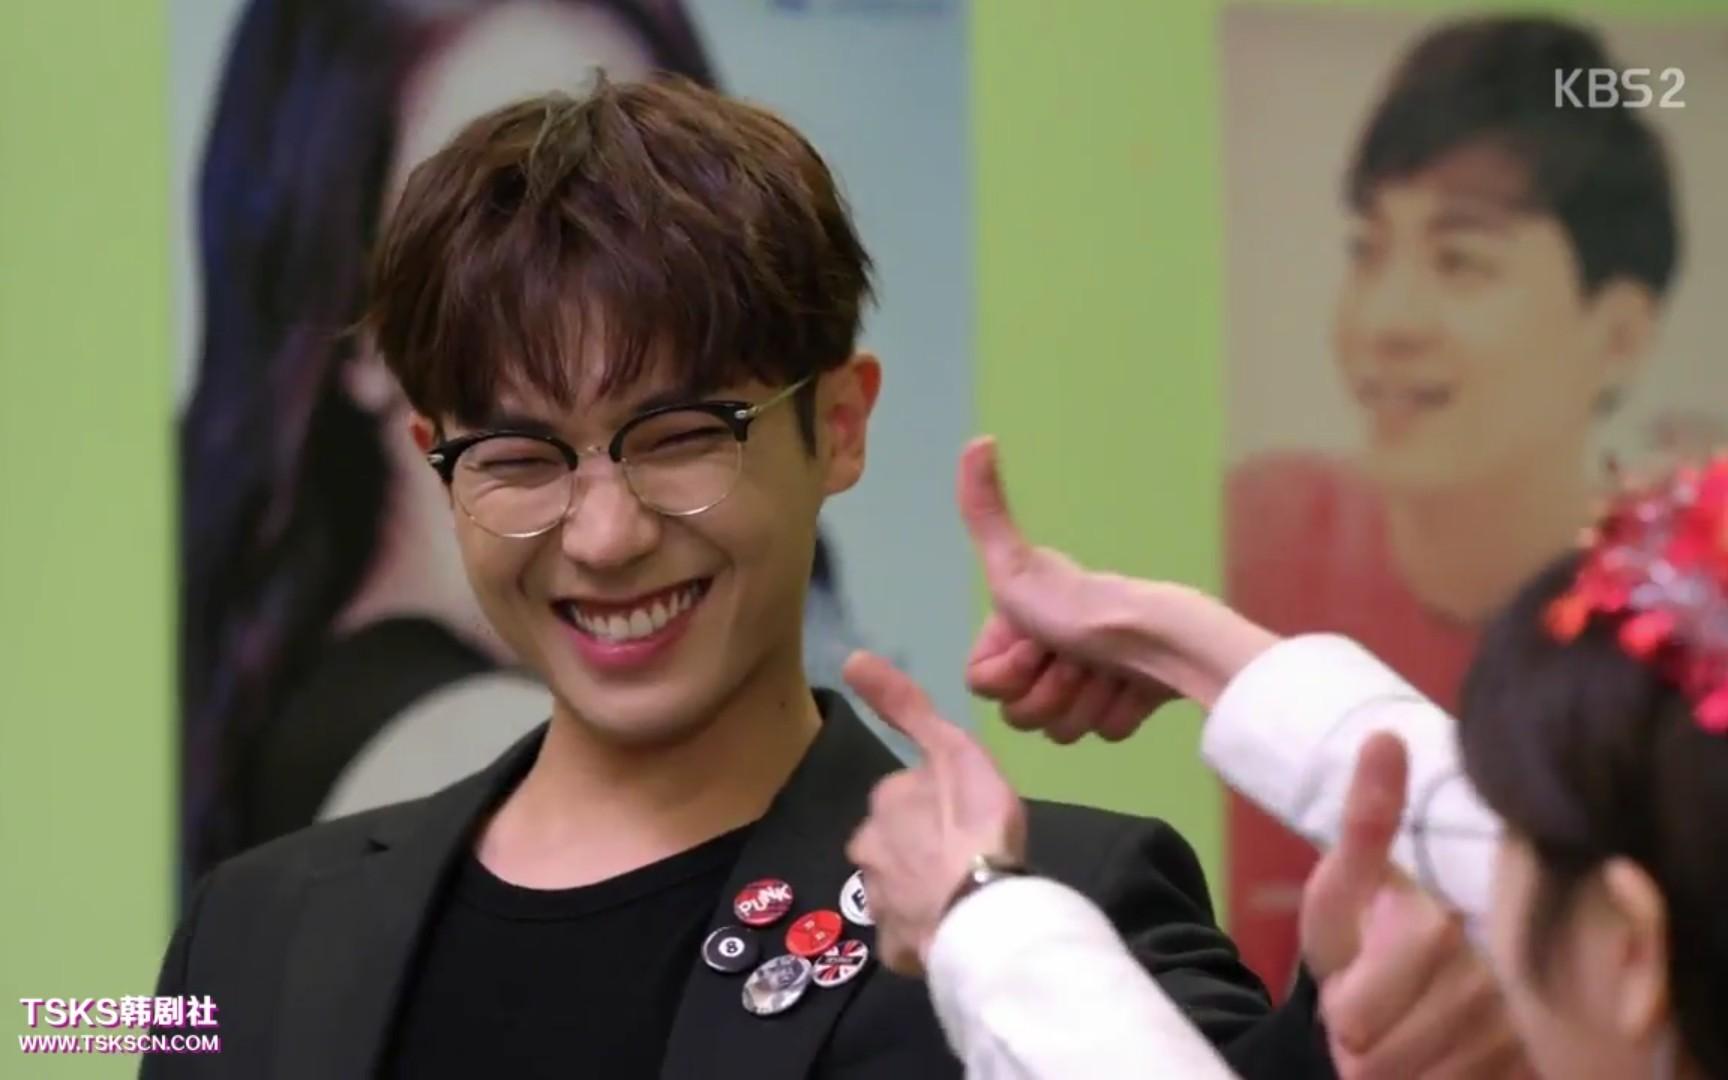 【爸爸好奇怪】 28集安演員的生日驚喜_嗶哩嗶哩 (゜-゜)つロ 干杯~-bilibili